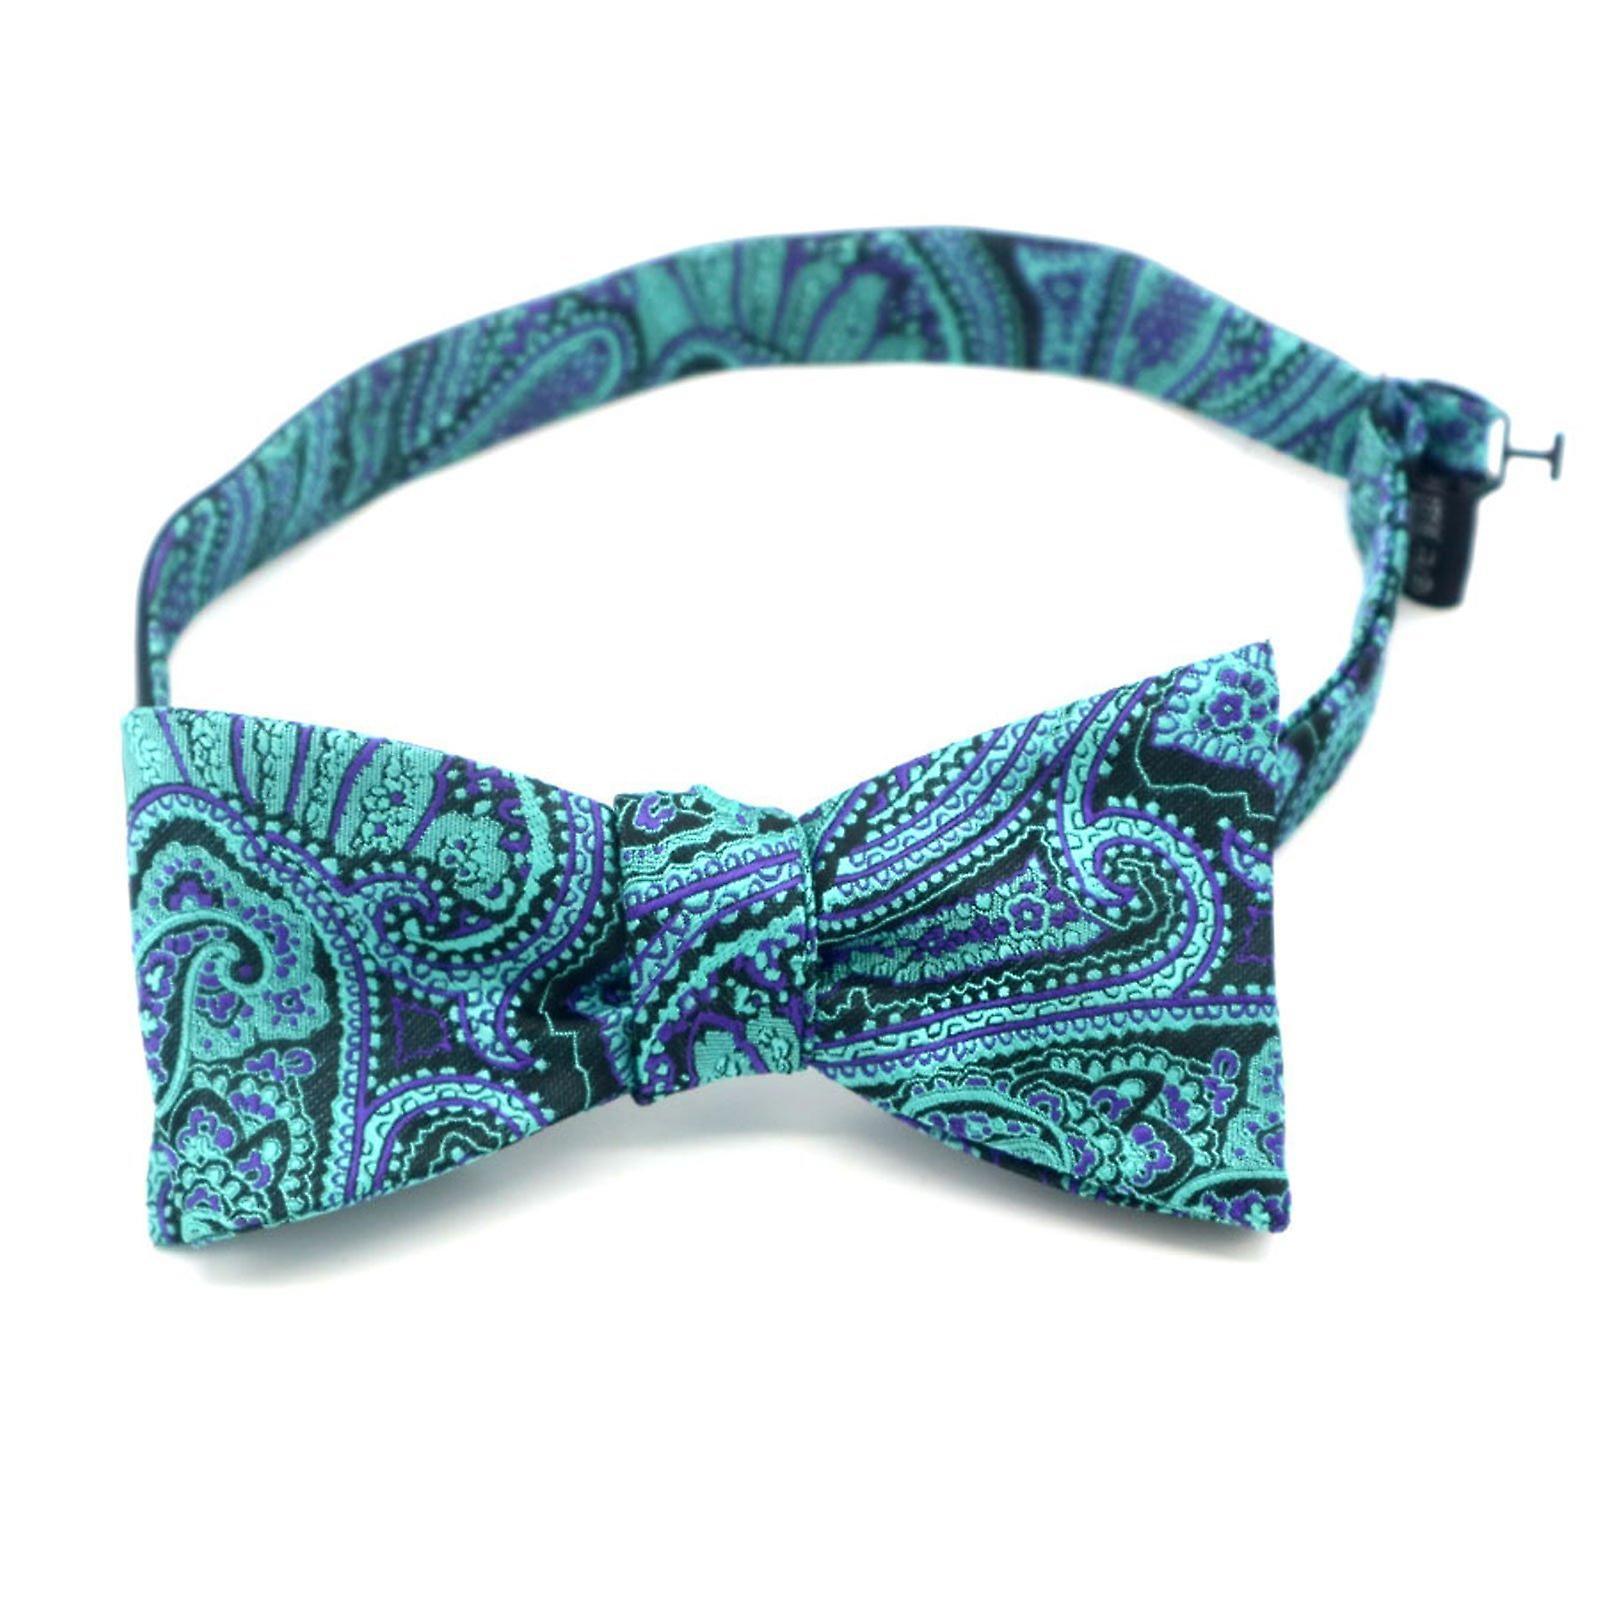 Green & purple paisley self bow tie & pocket square